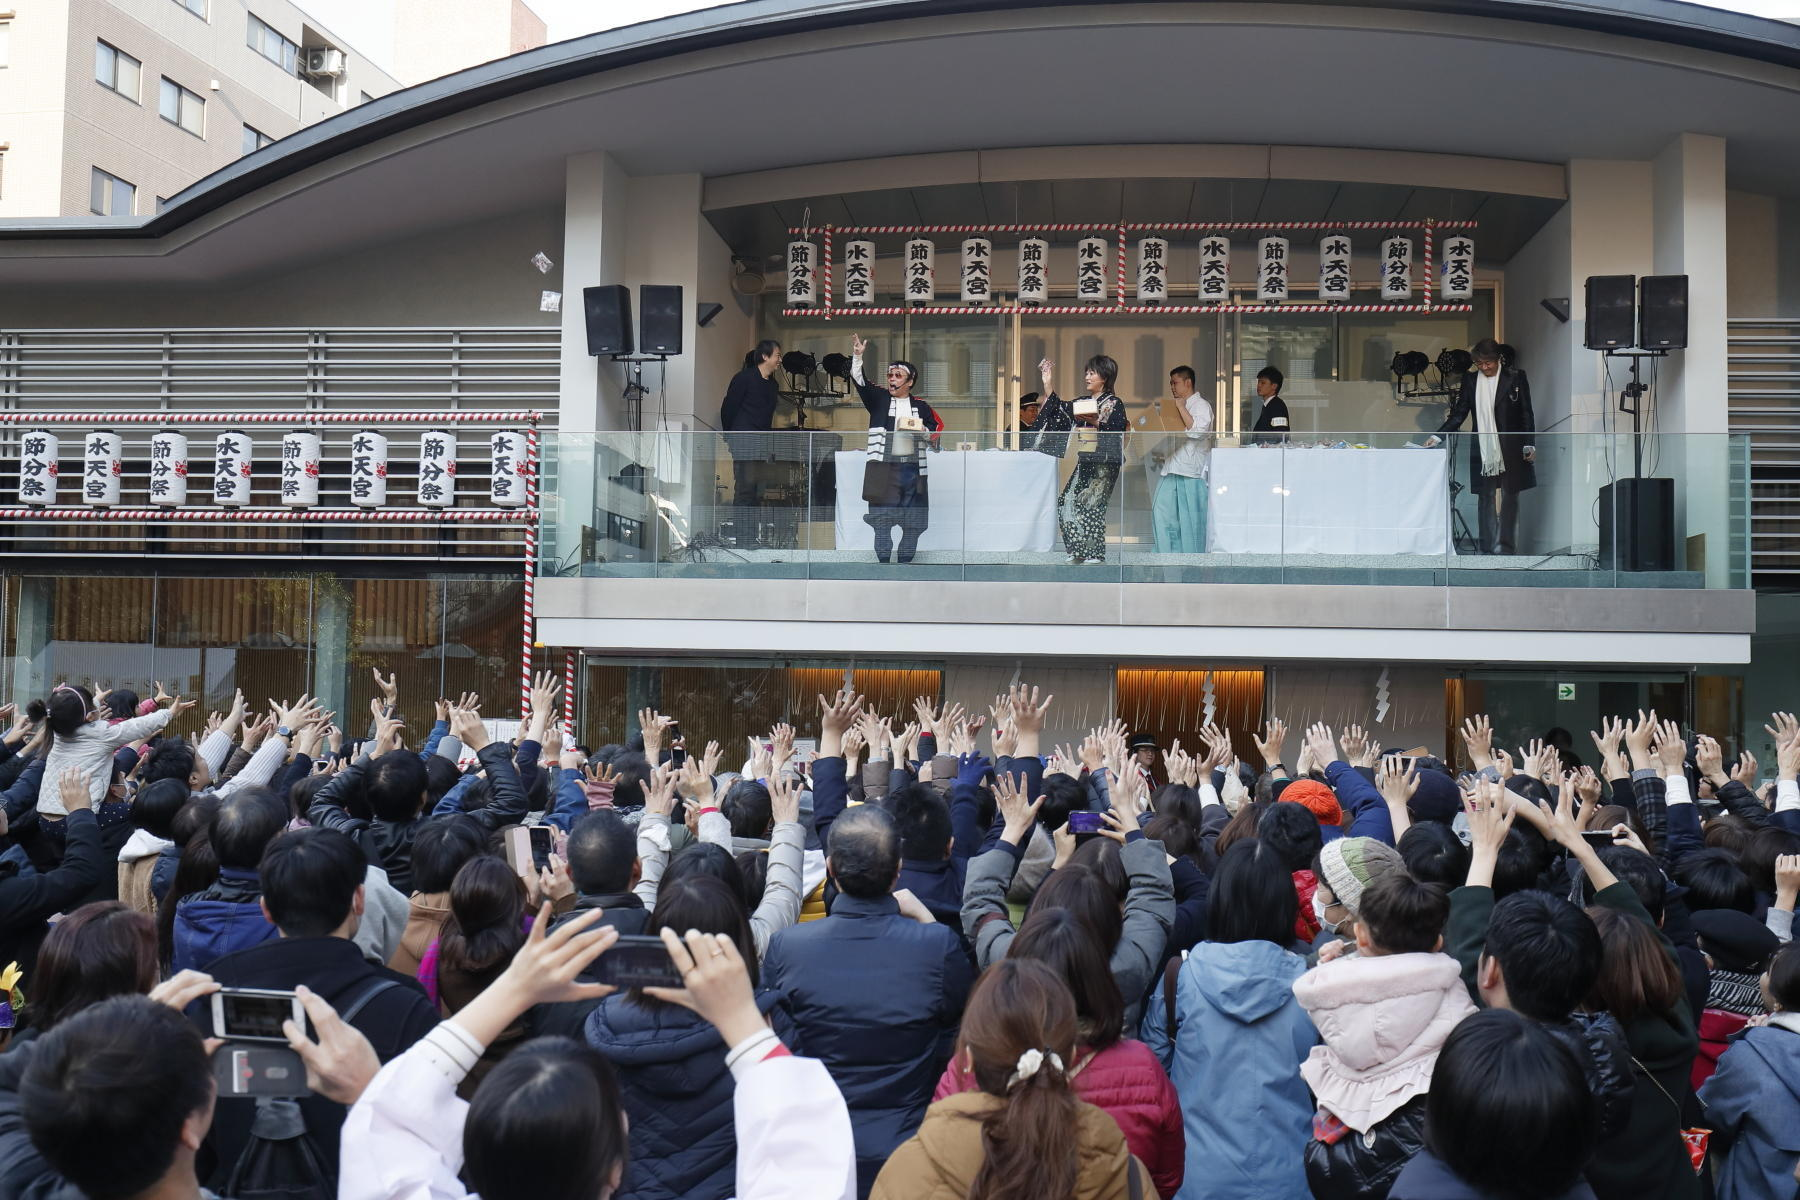 http://news.yoshimoto.co.jp/20190203205404-8980f8252c08c4df0876e687e9a78a9b6ec2ac7f.jpg